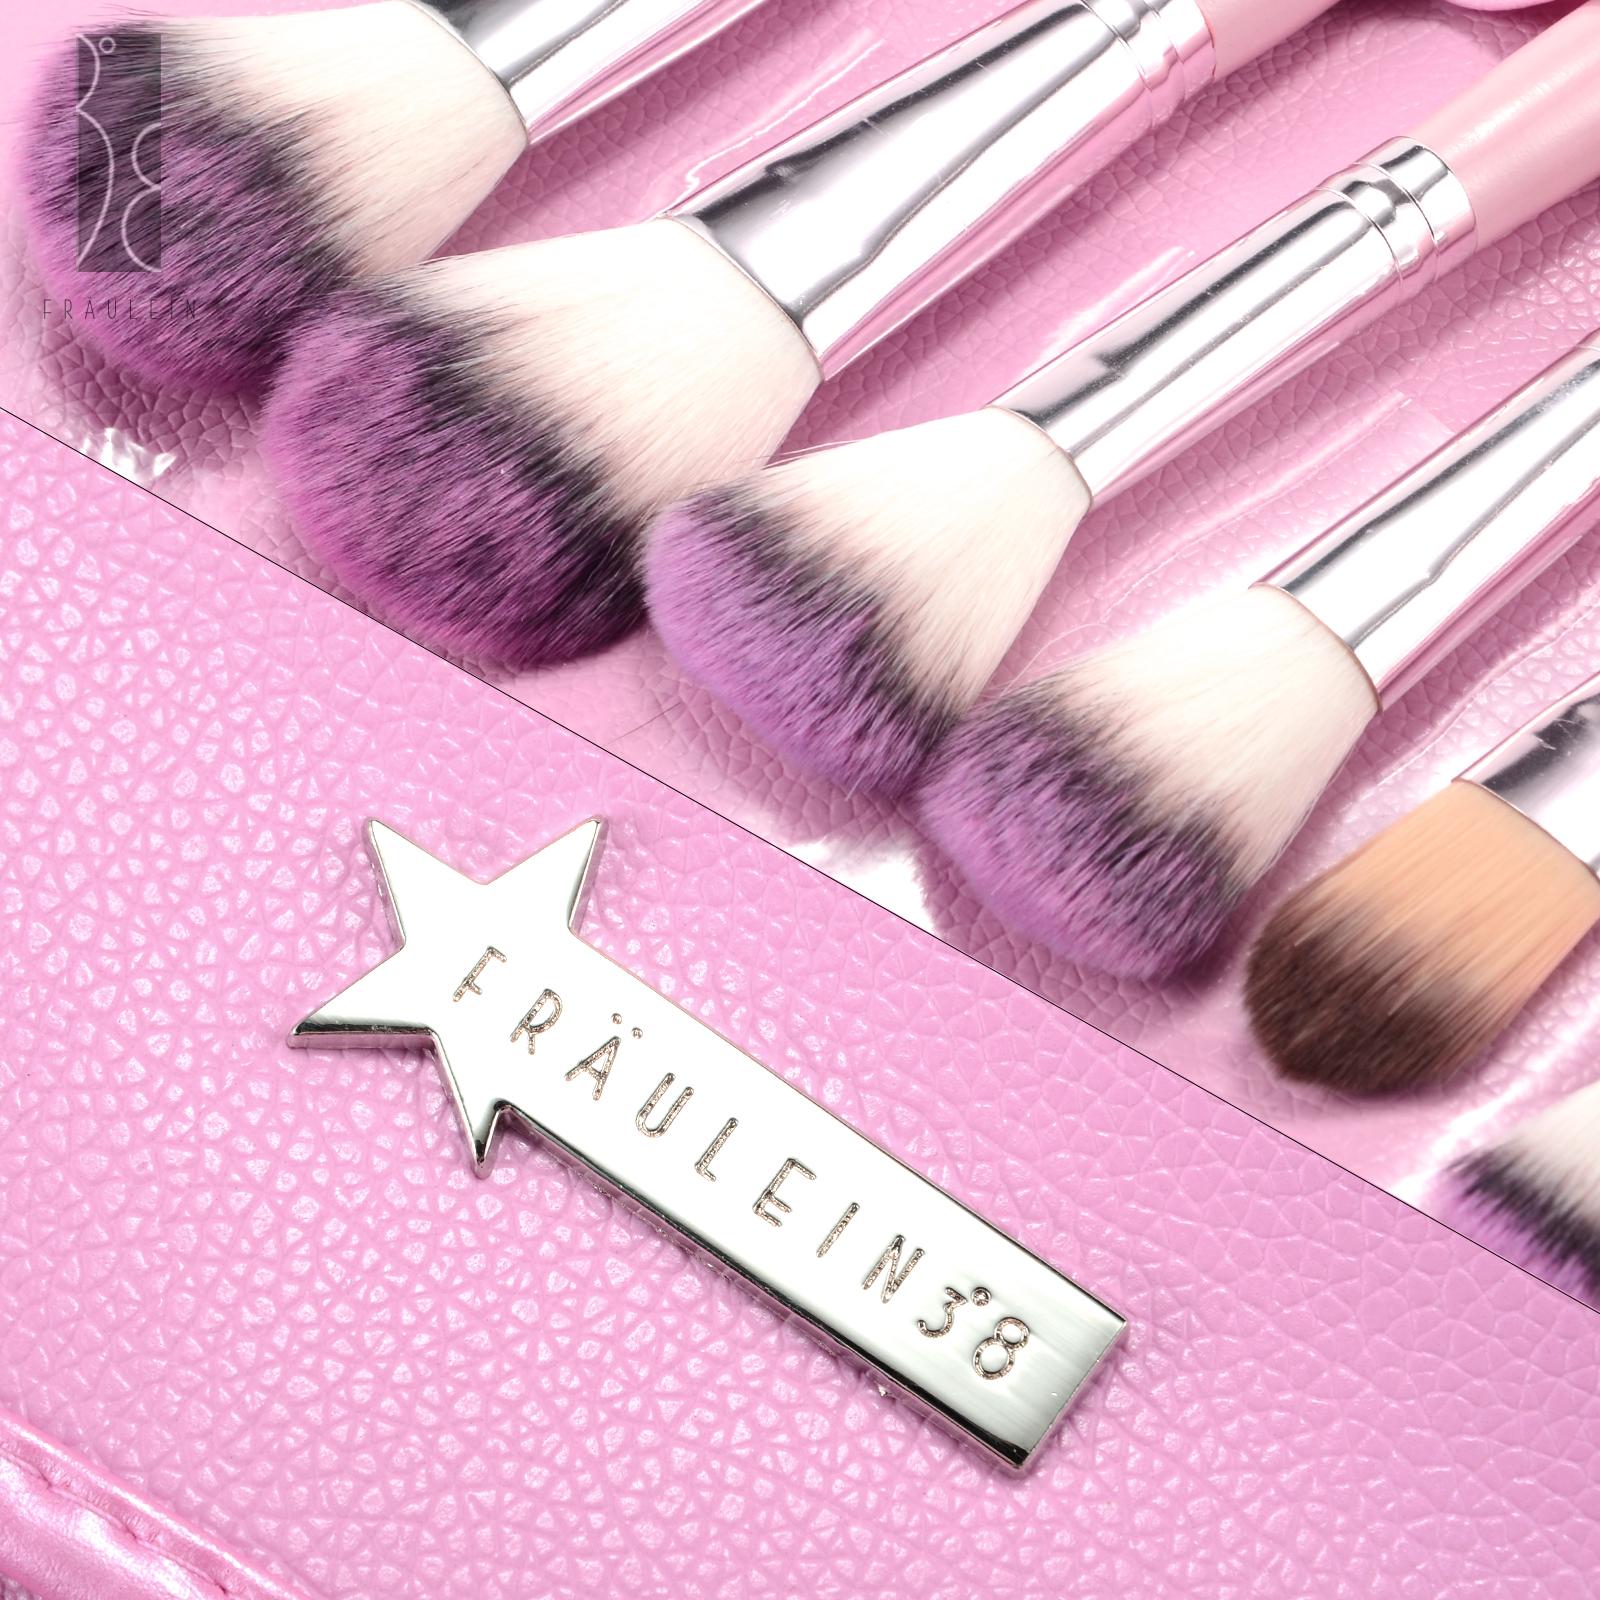 fr ulein 3 8 31tlg pinselset make up pinsel set brush kosmetik etui ebay. Black Bedroom Furniture Sets. Home Design Ideas